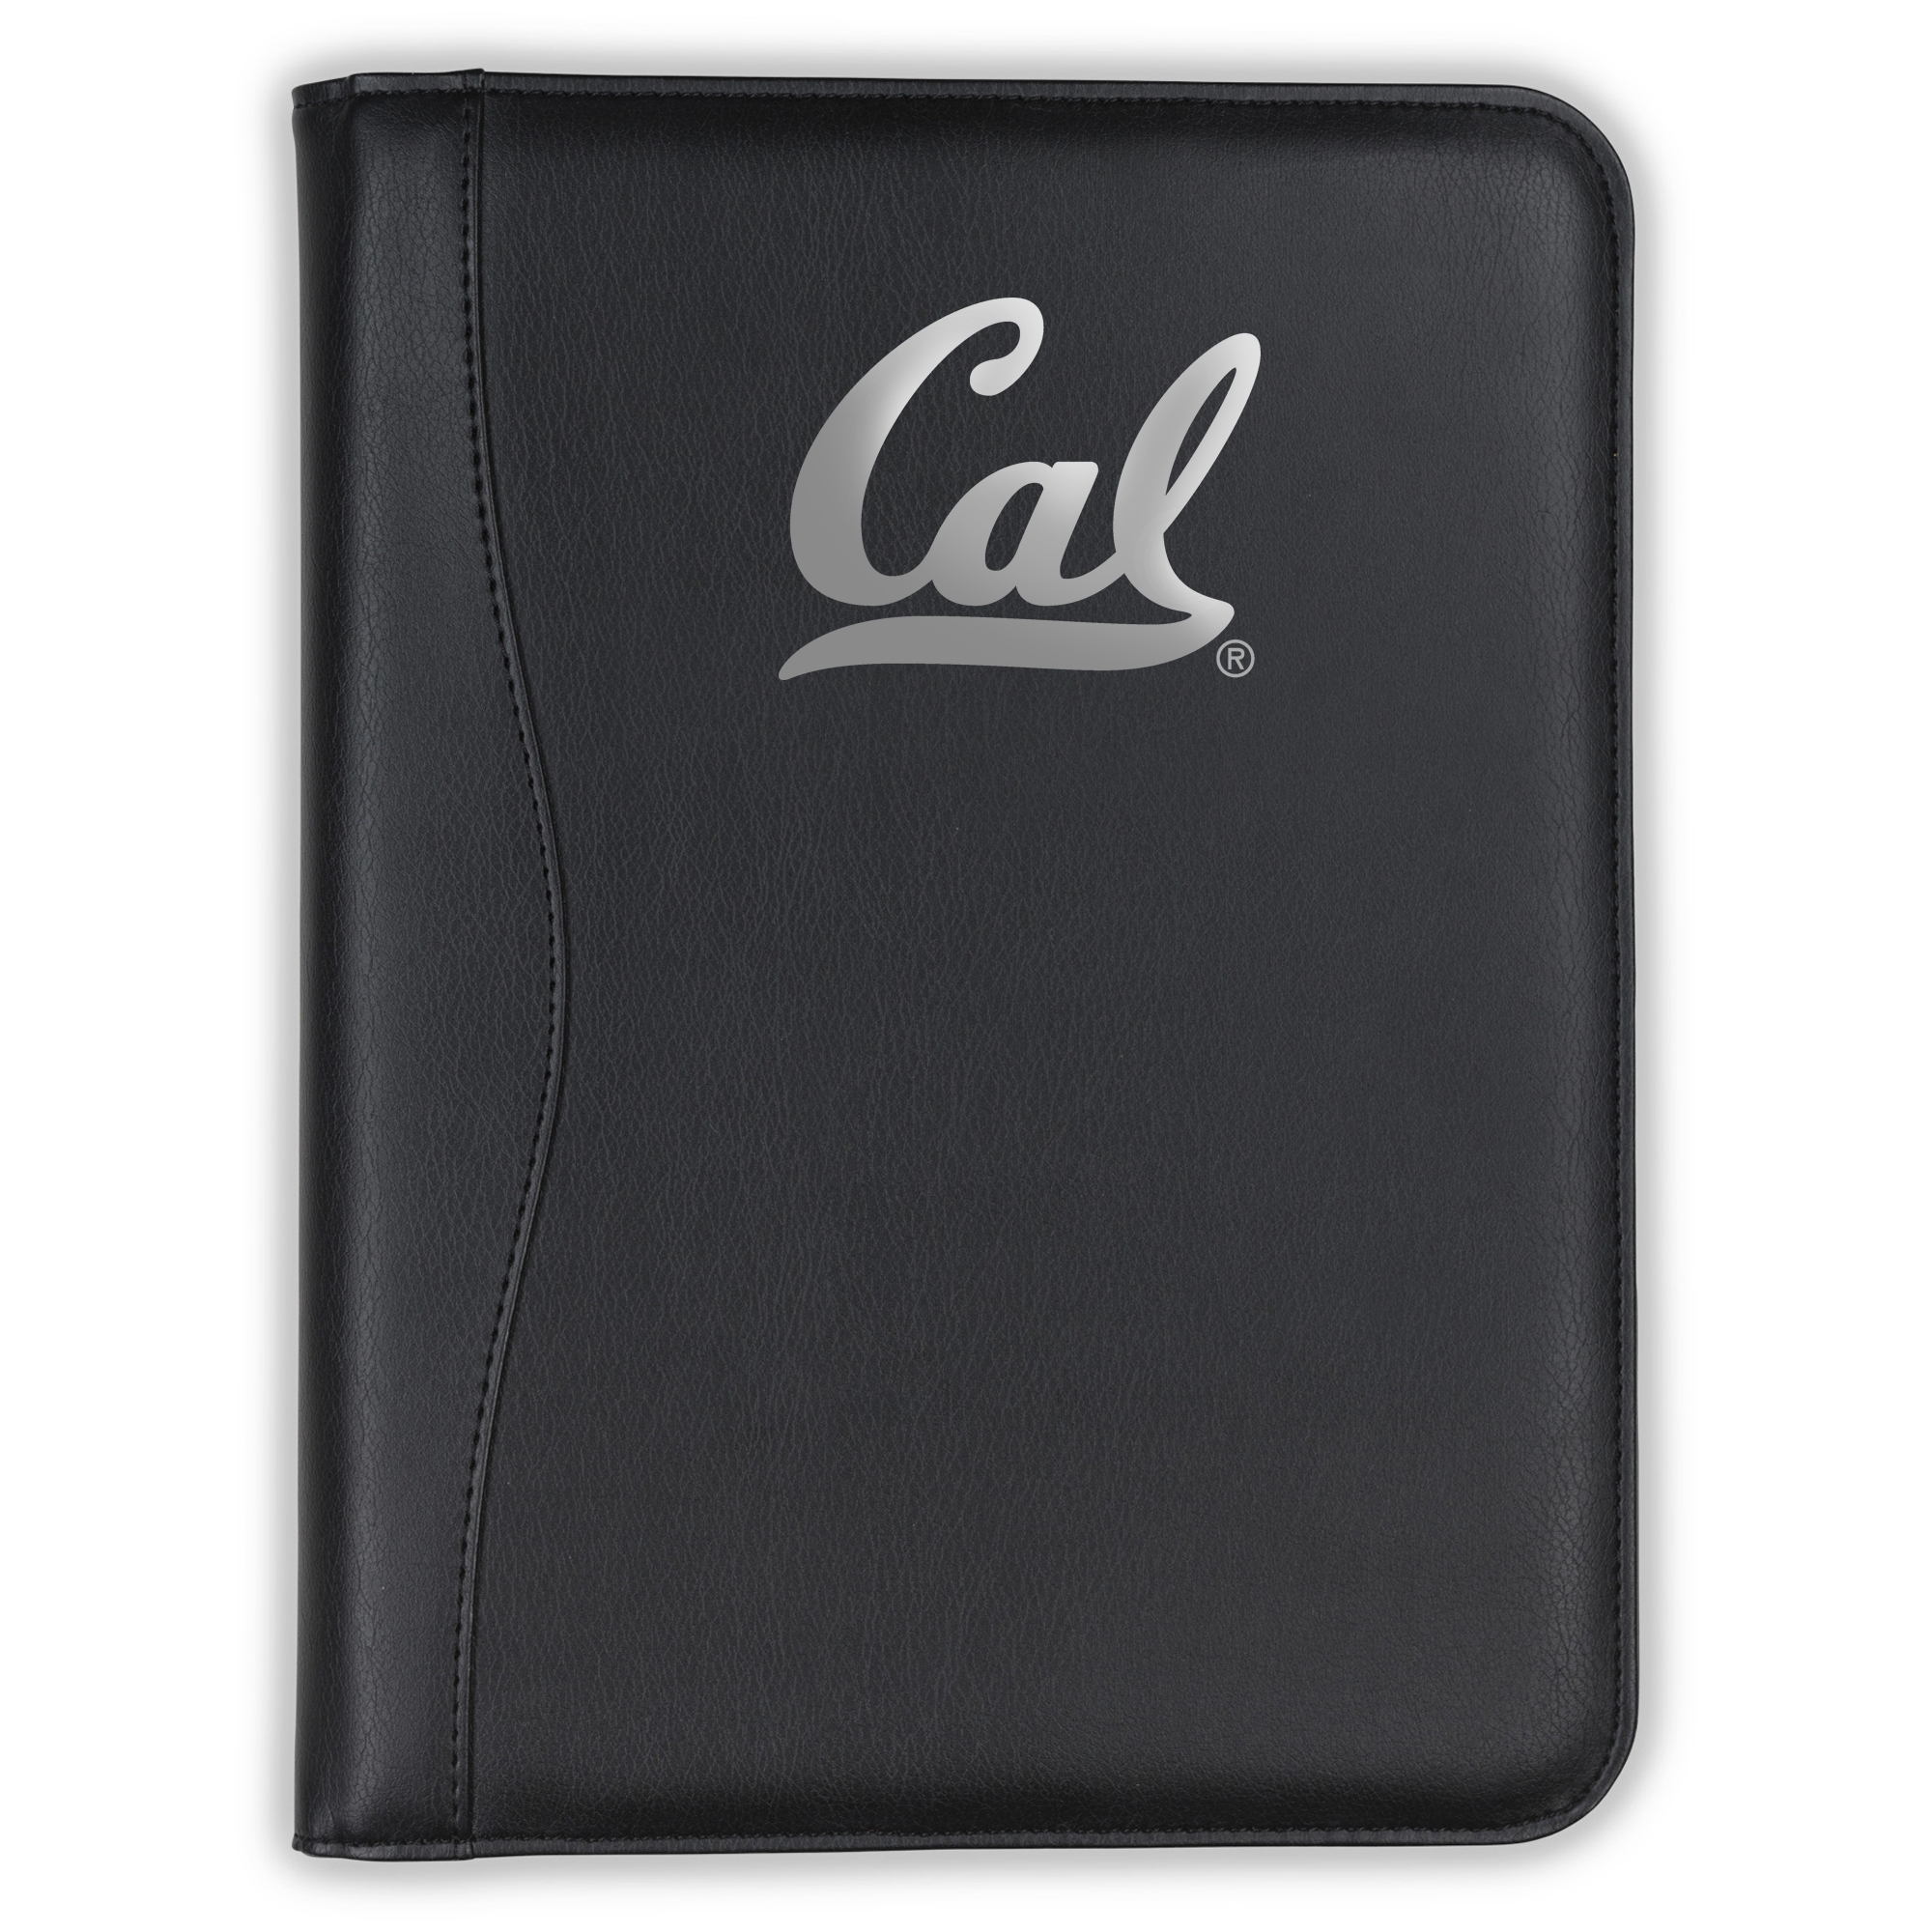 University of California Berkeley Executive Padfolio Cal Logo